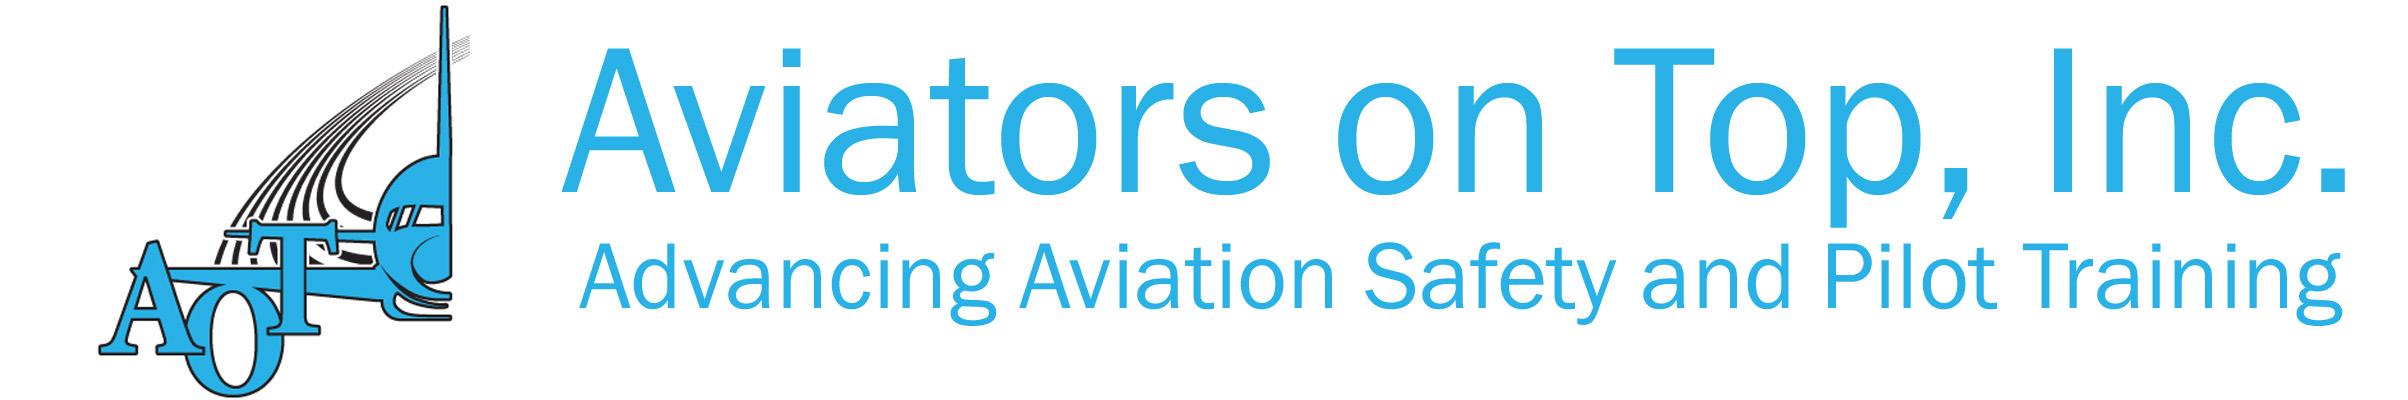 Aviators on Top, Inc.